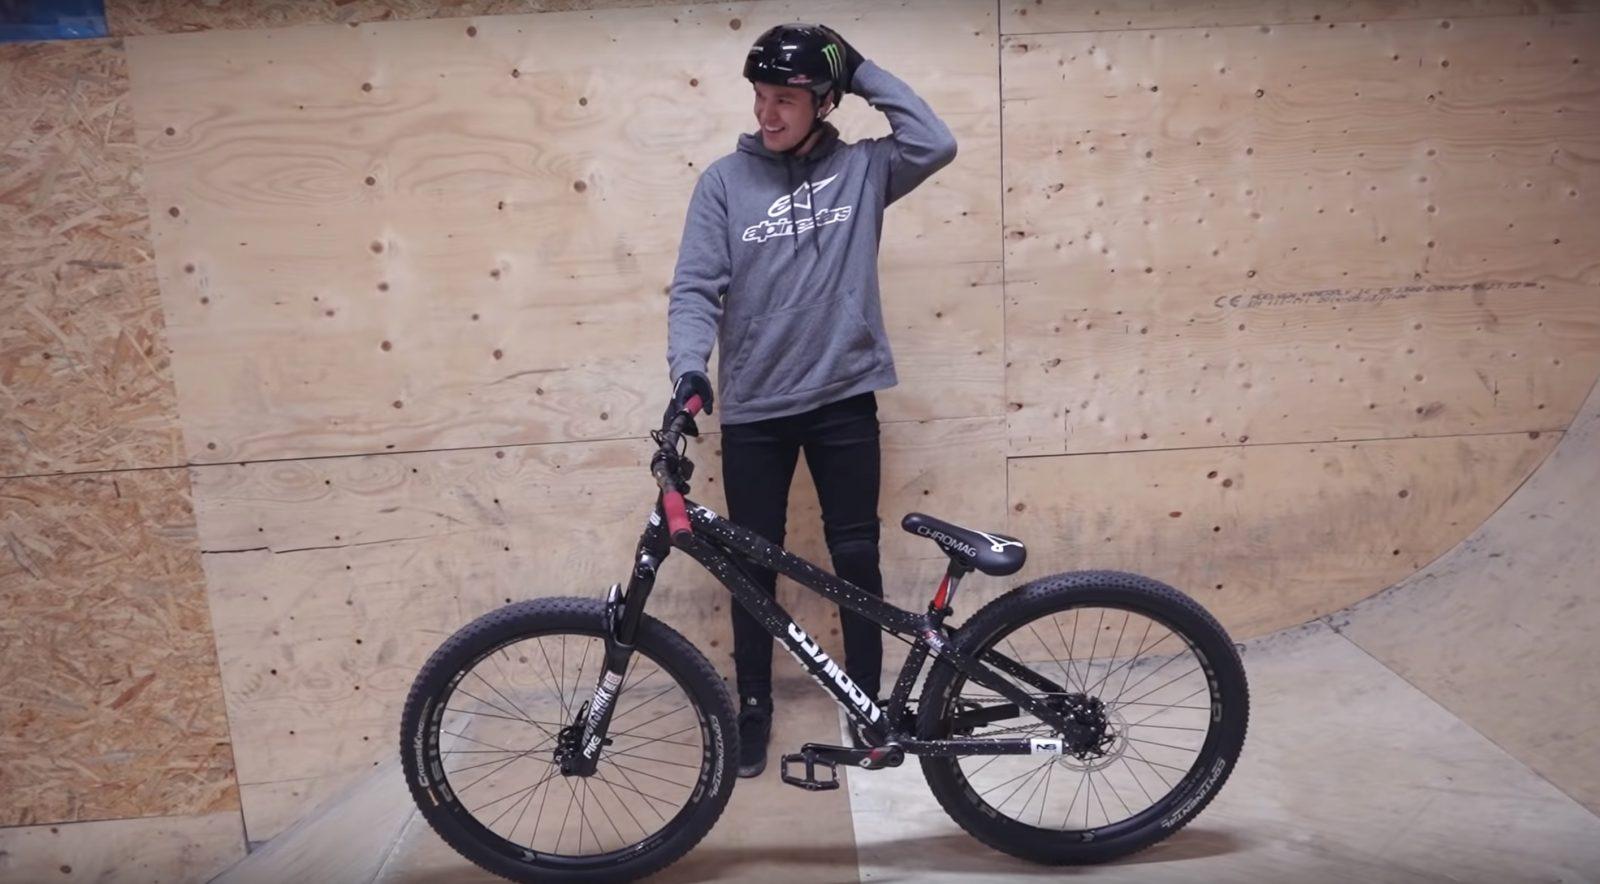 afa3ca963e5 MTB-MAG.COM - Mountain Bike Magazine | [Video] HOW TO BE A SWEDISH ...